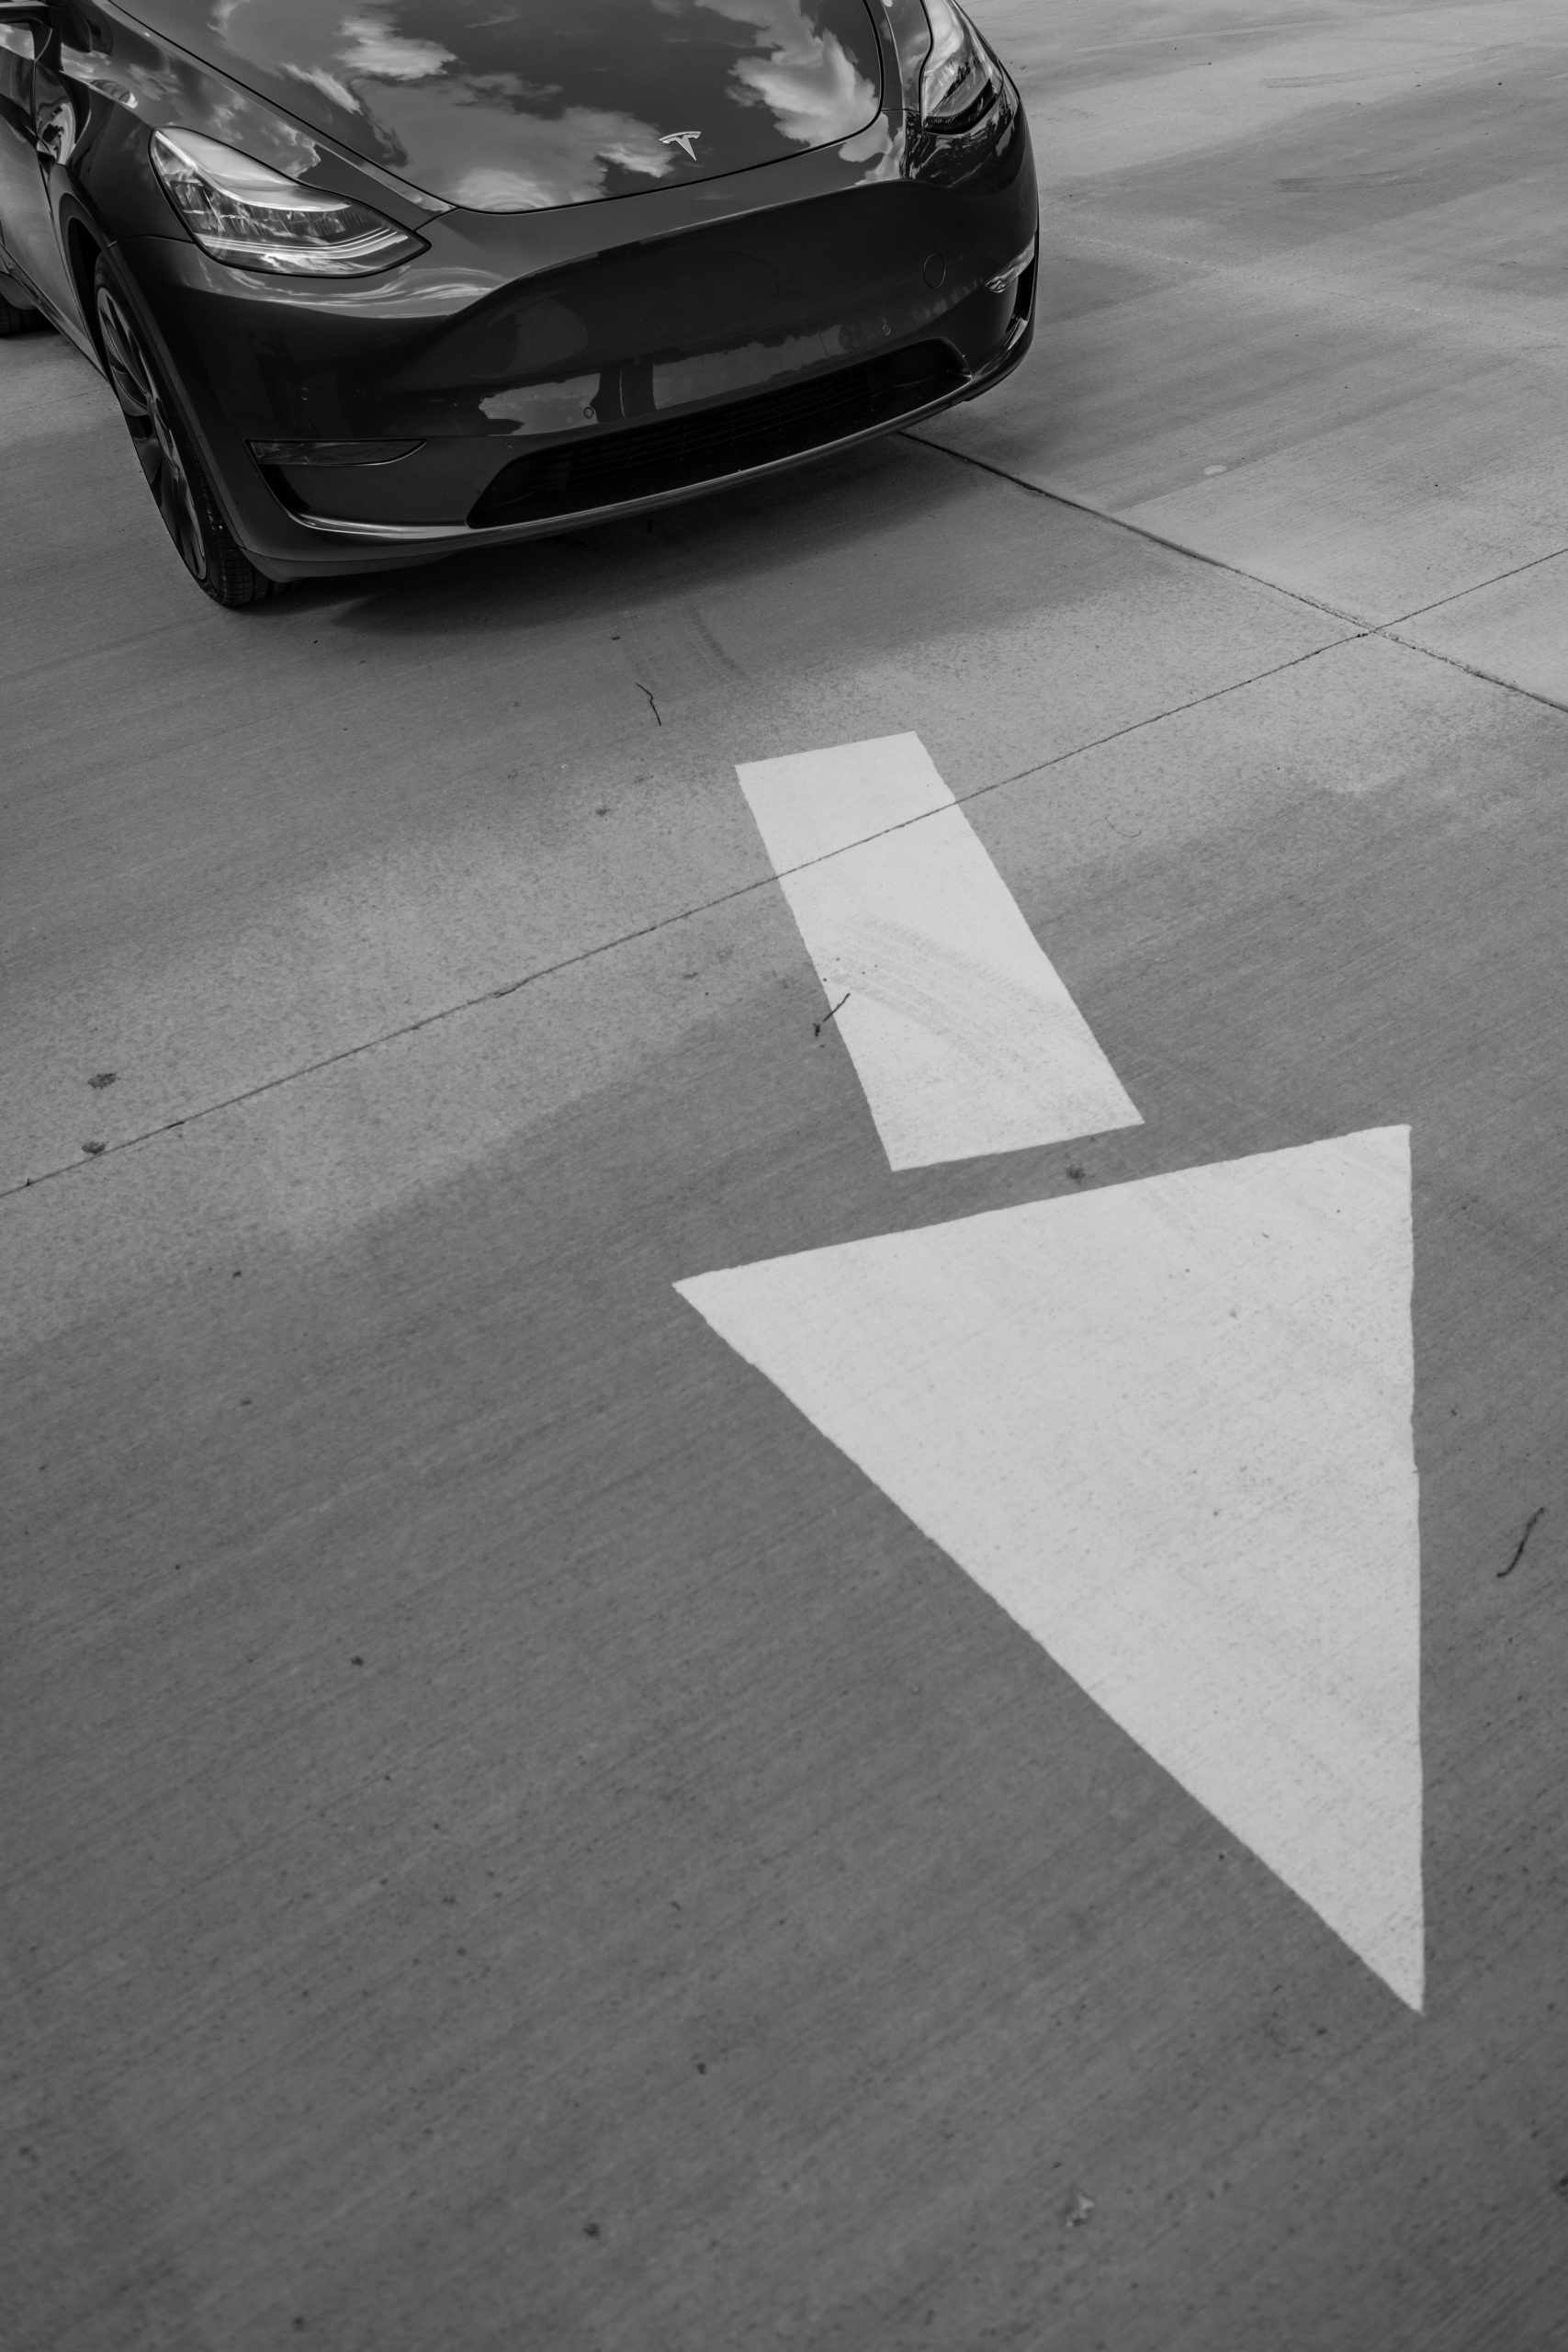 Tesla Model Y pavement arrow front action